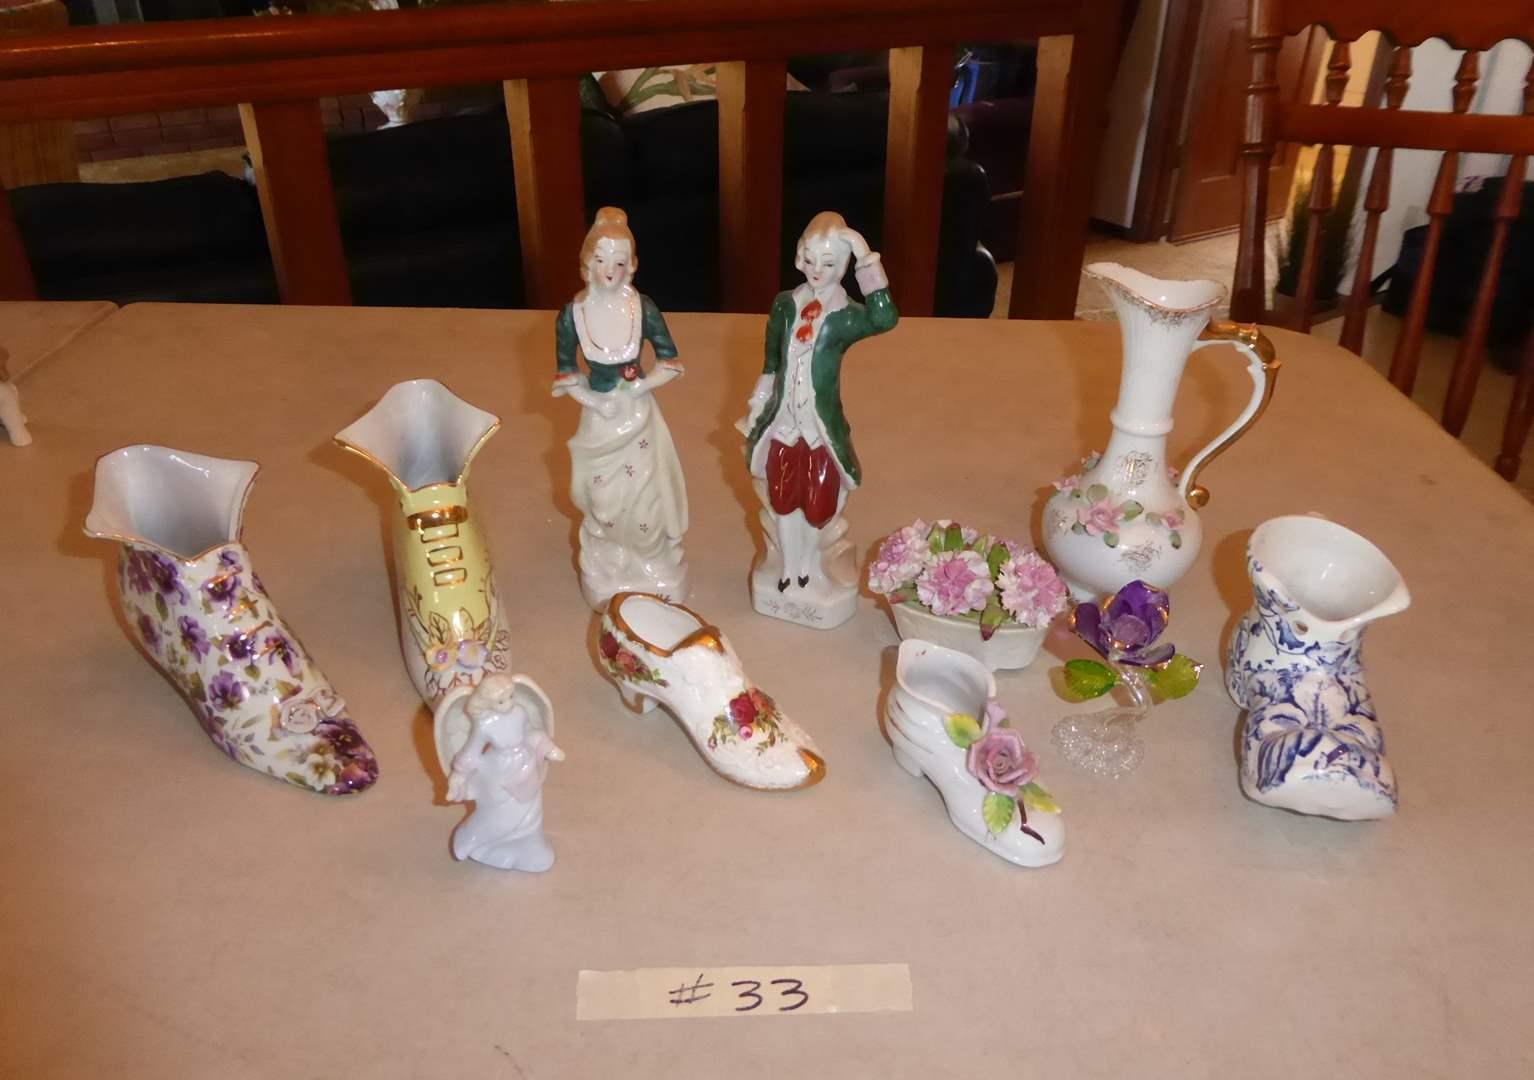 Lot # 33 - Ceramic Figurines (Occupied Japan) Ansley Basket & Ceramic Shoes  (main image)